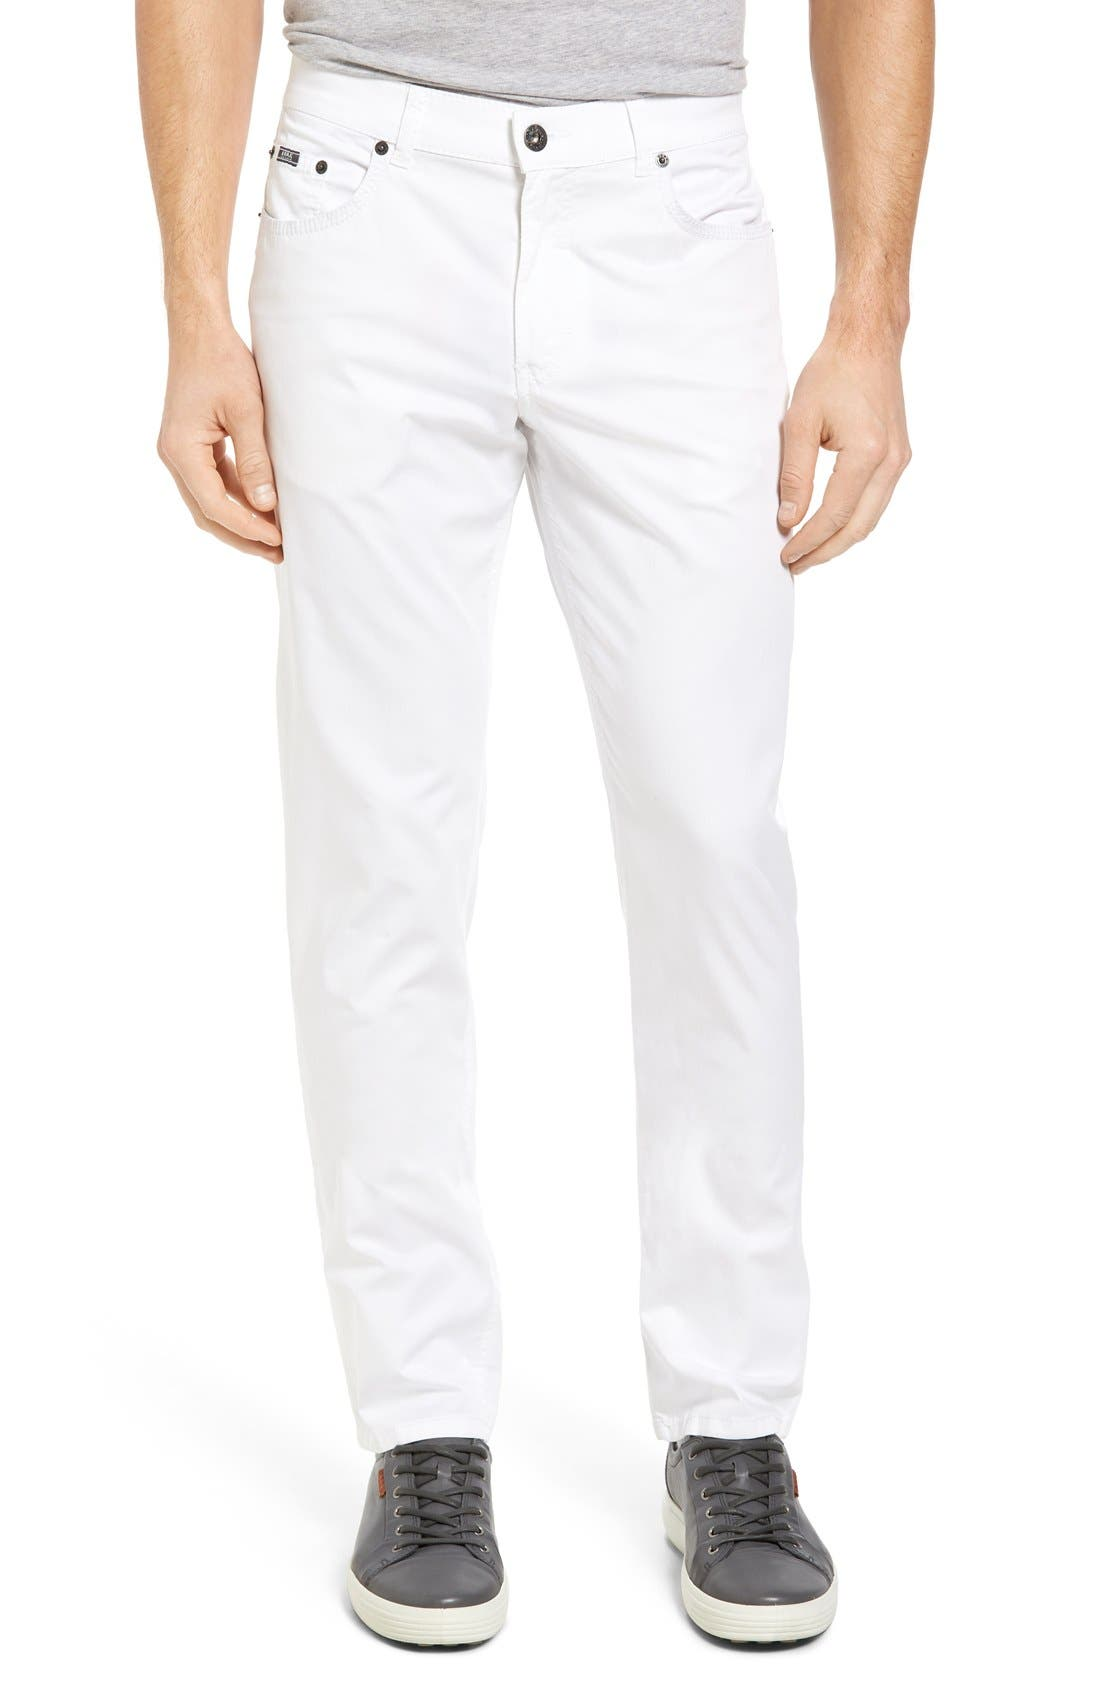 Brax Prestige Stretch Cotton Pants